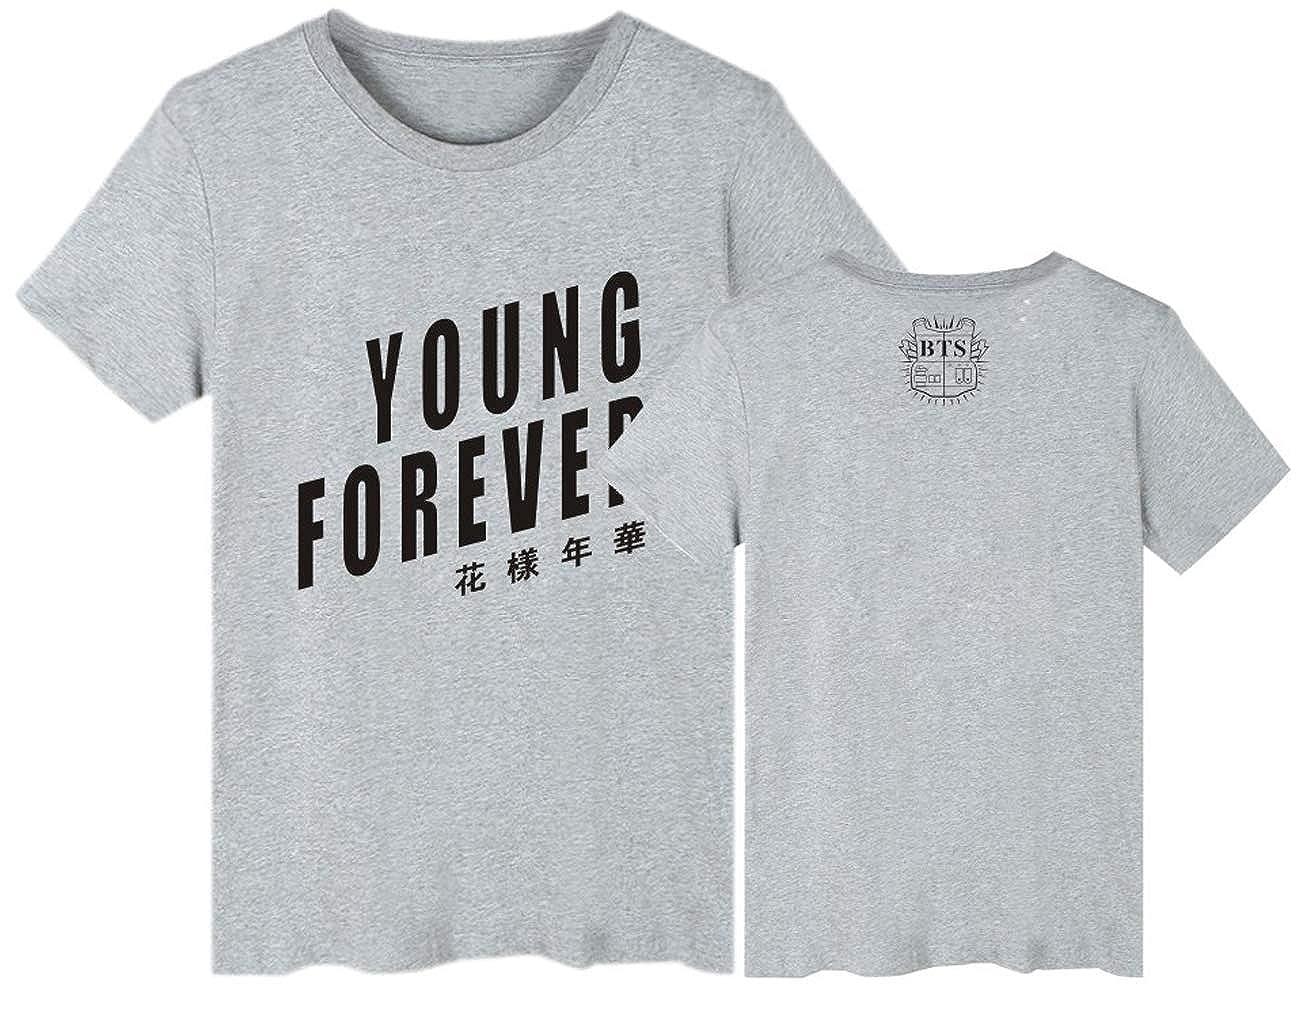 Leslady Unisex Camicie Estate Top KPOP Bangtan Boys BTS T-Shirt e di Save Me Concert per Army